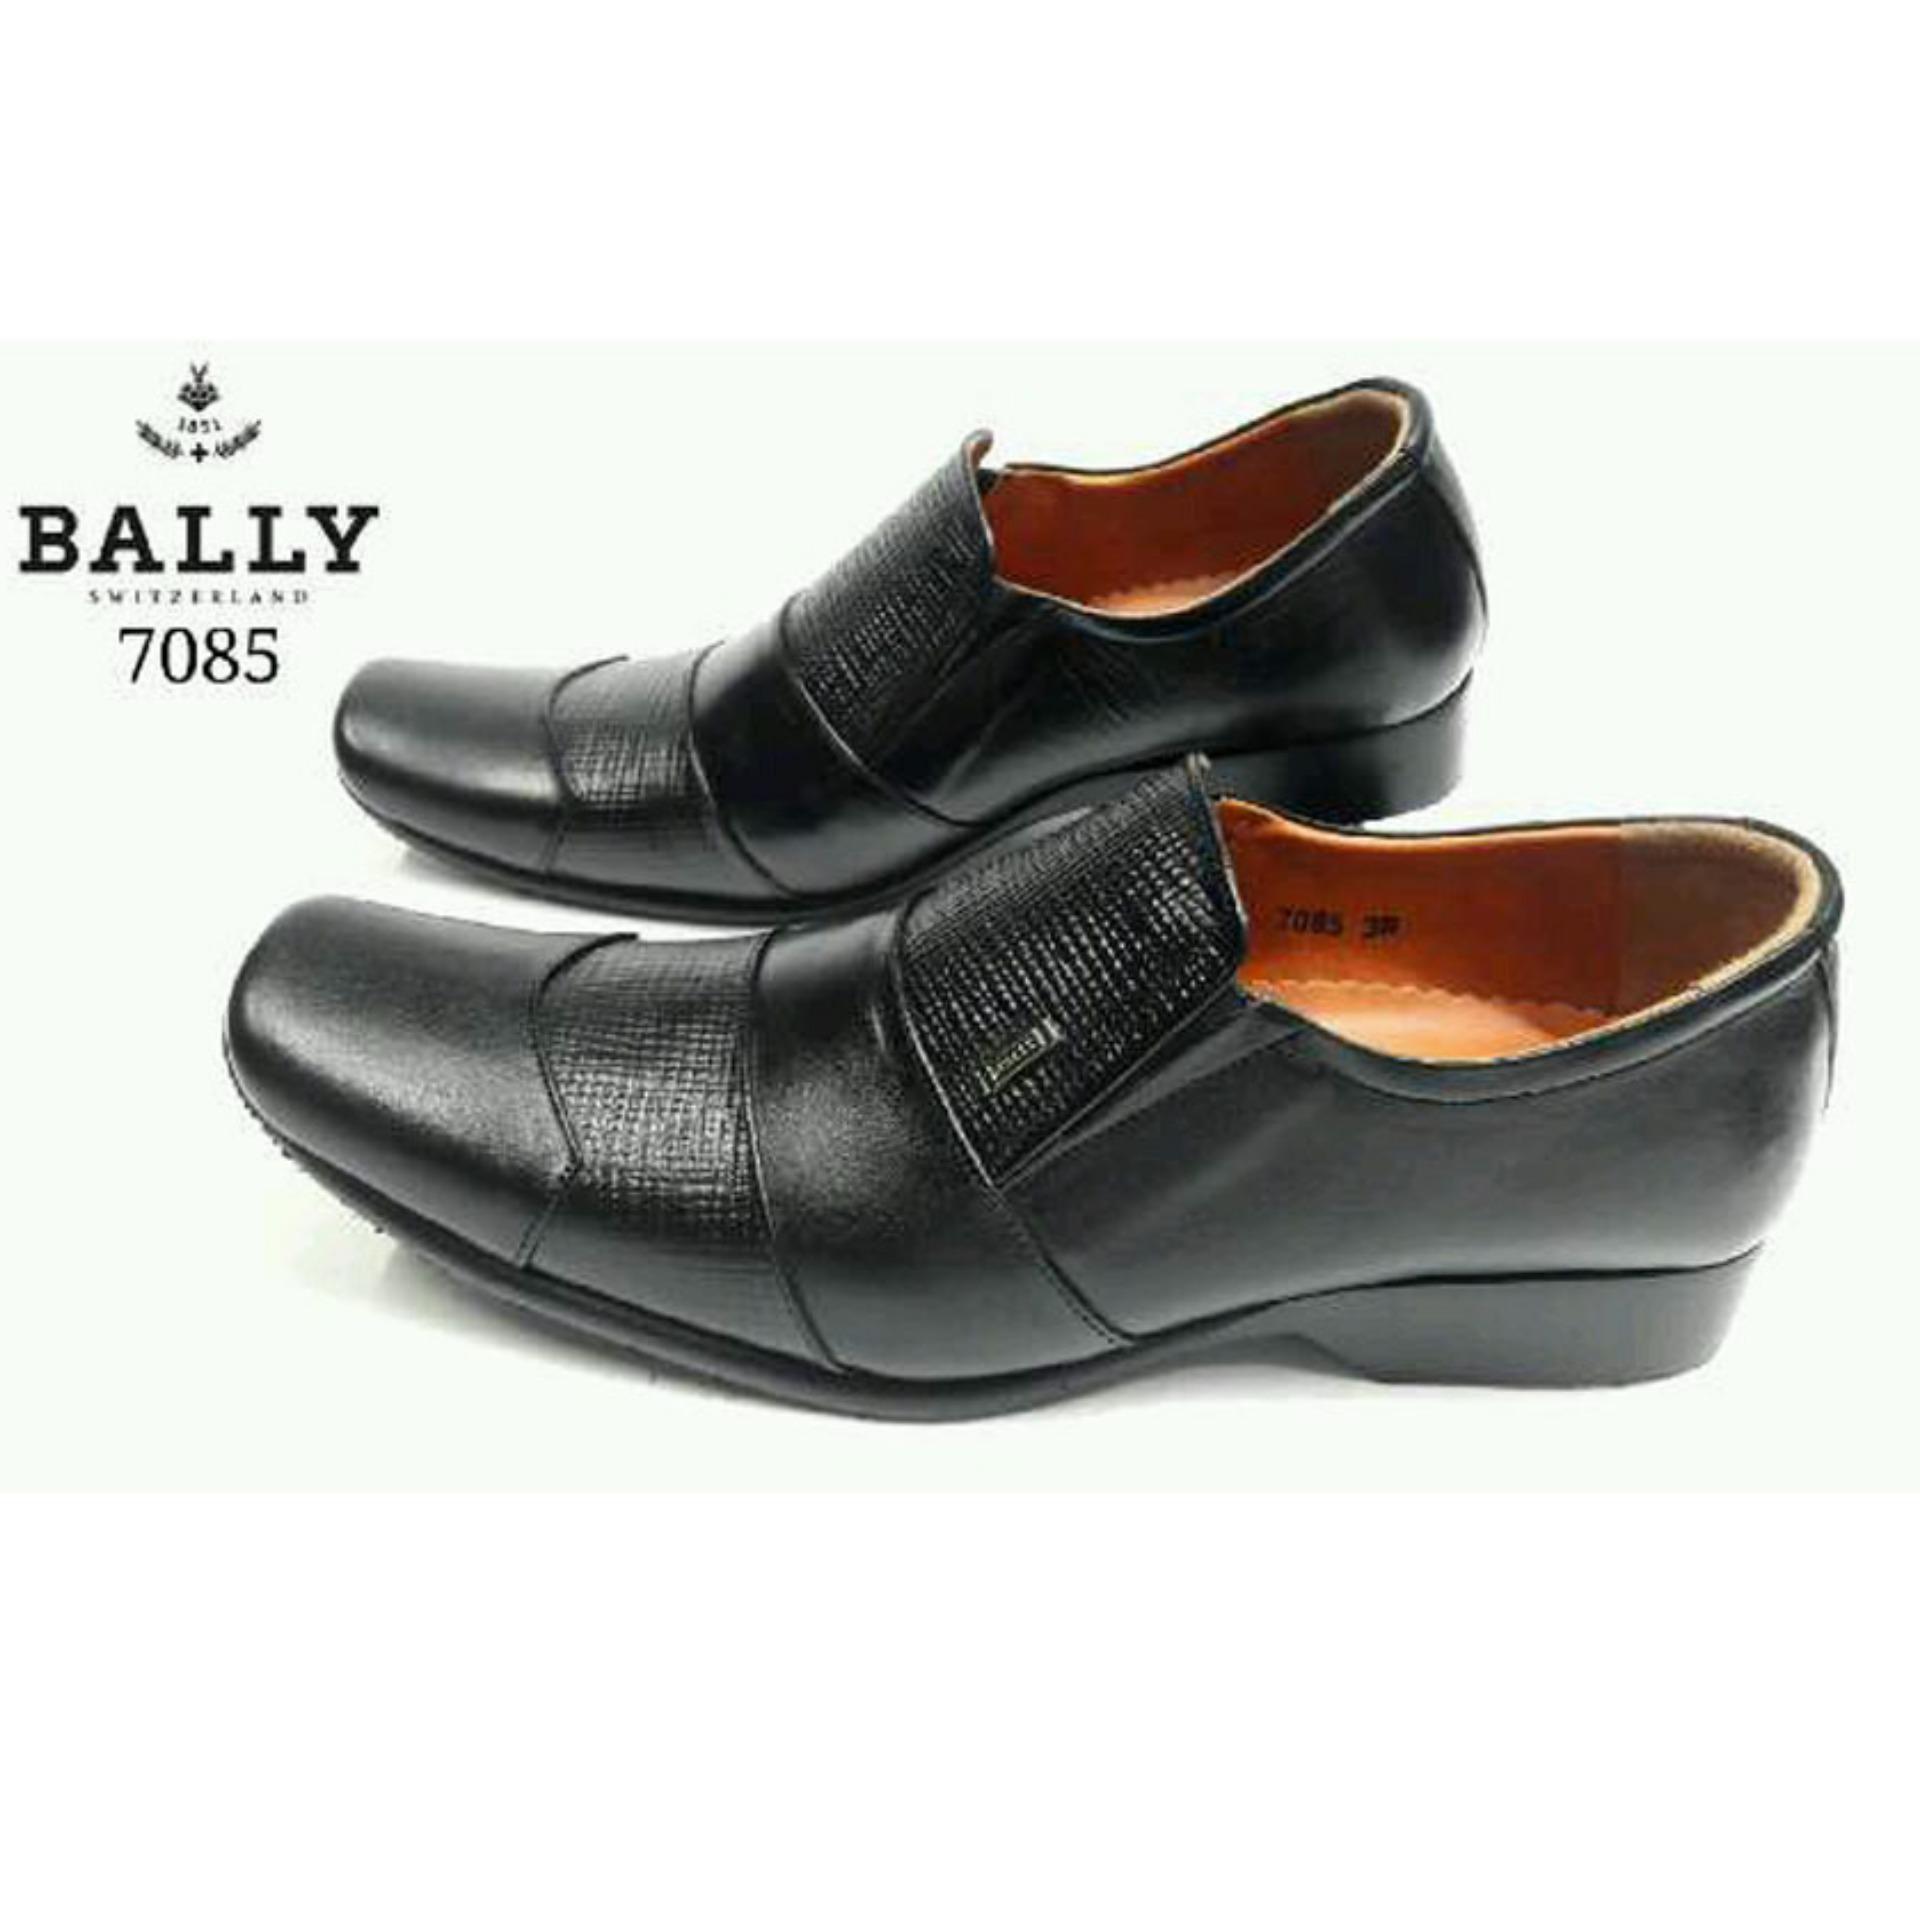 BALLY Switzerland Sepatu Formal Pria KULIT ASLI 7085